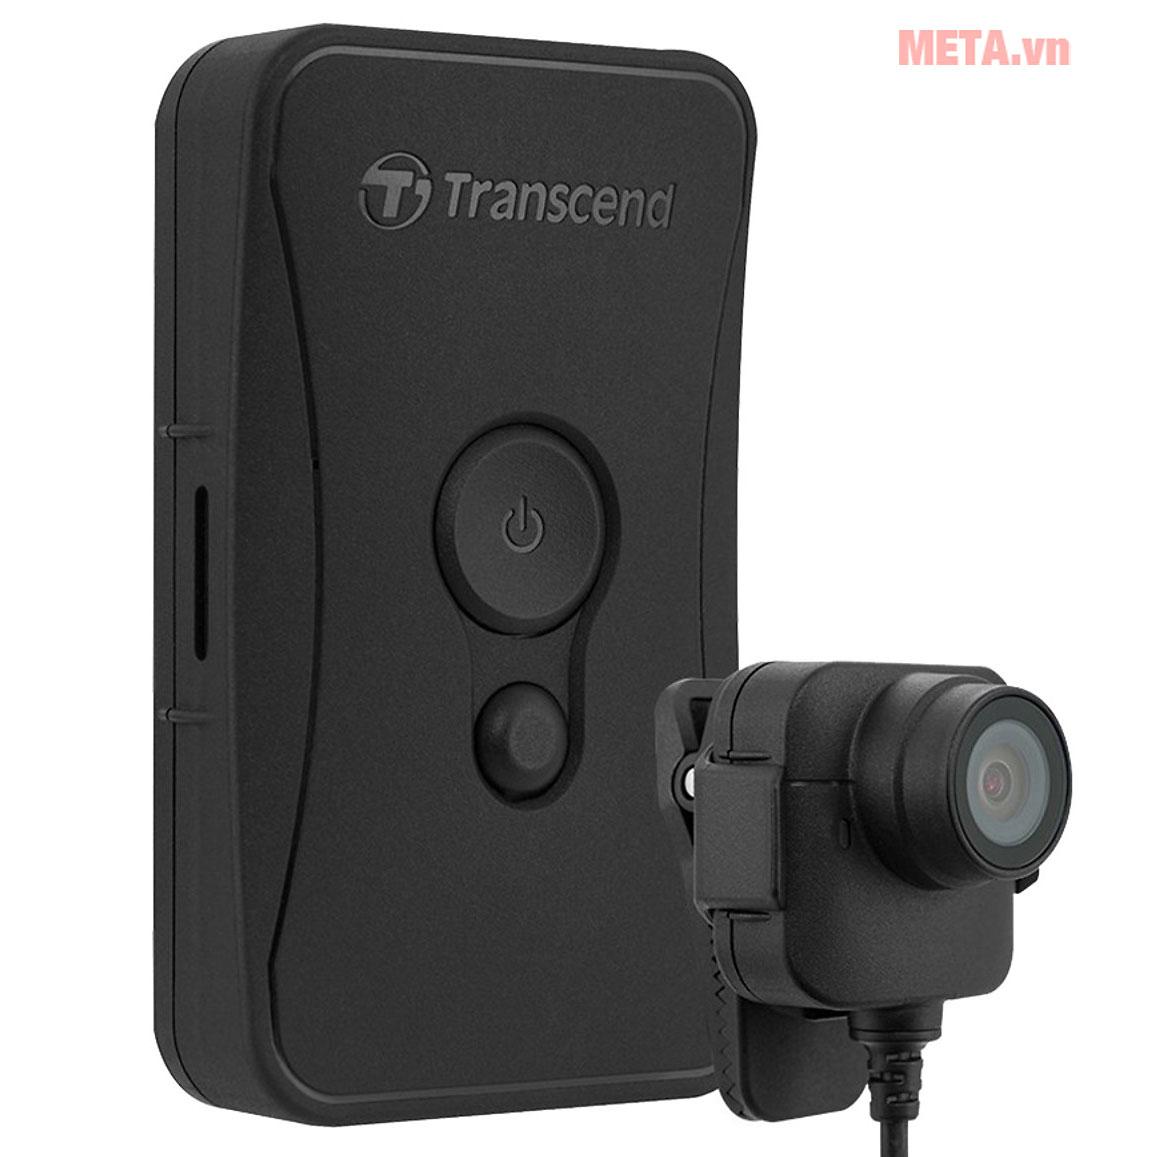 Transcend DrivePro Body 52 hỗ trợ kết nối Internet qua Wifi